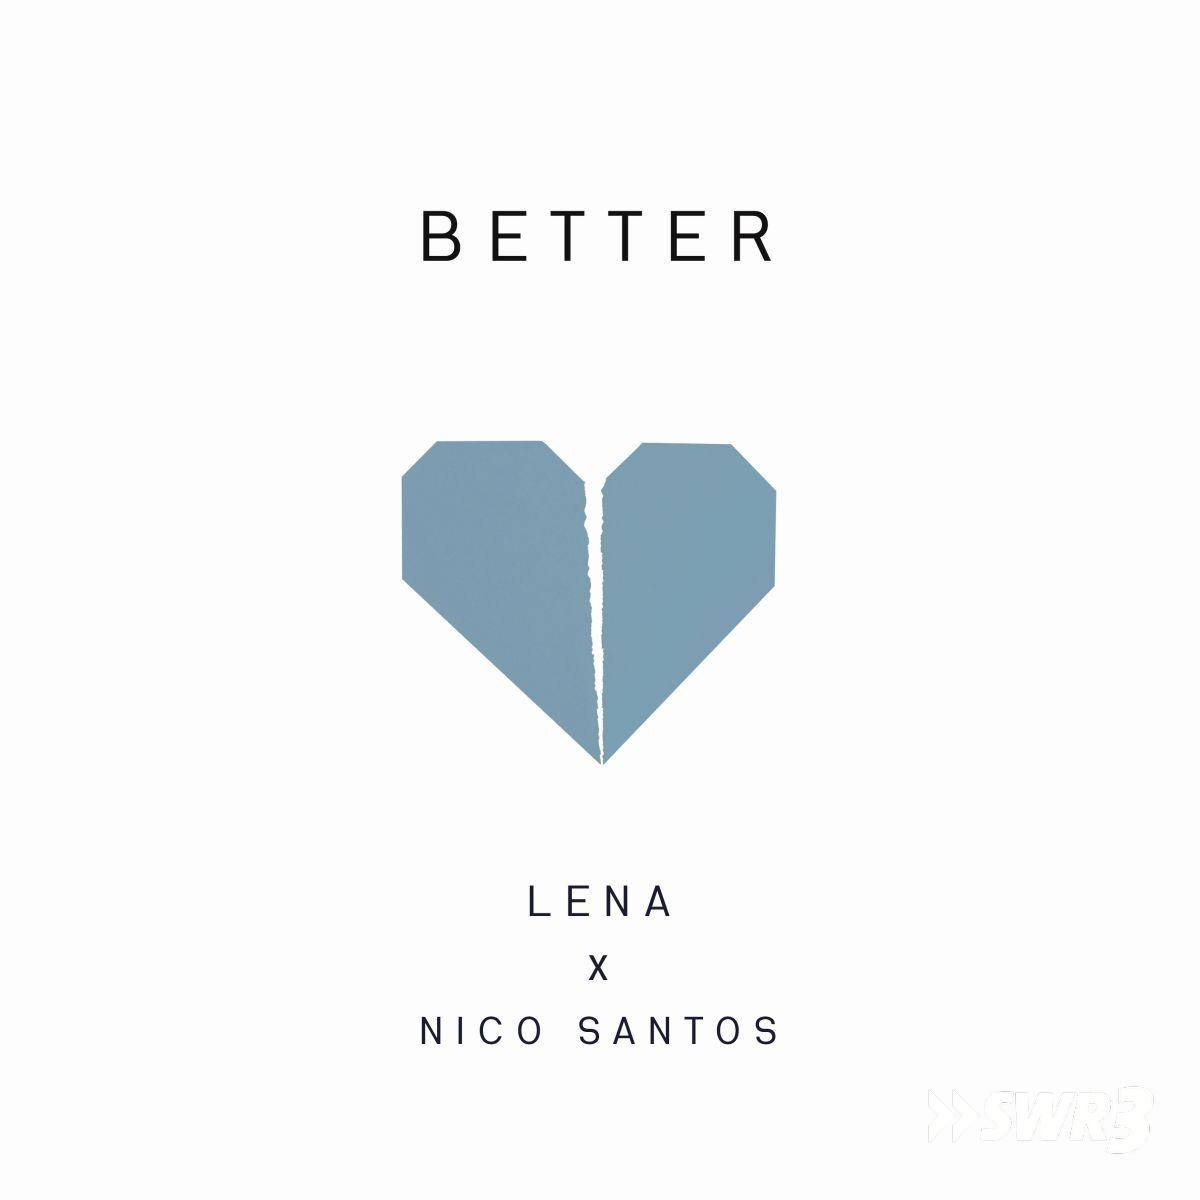 Better (Foto: Lena)